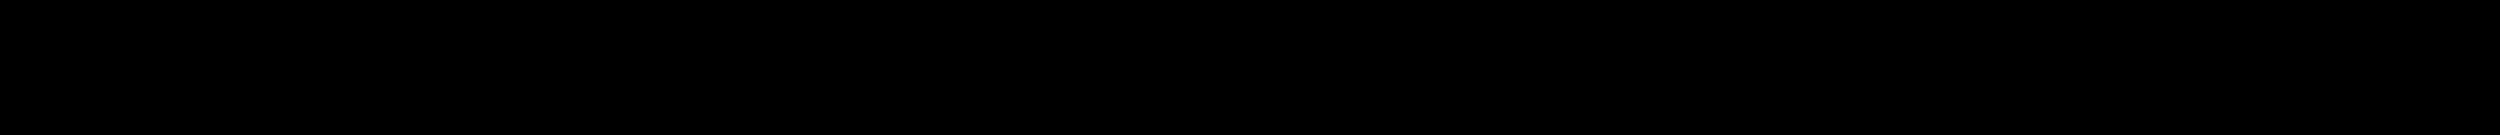 burk-uzzle-subs-4.png